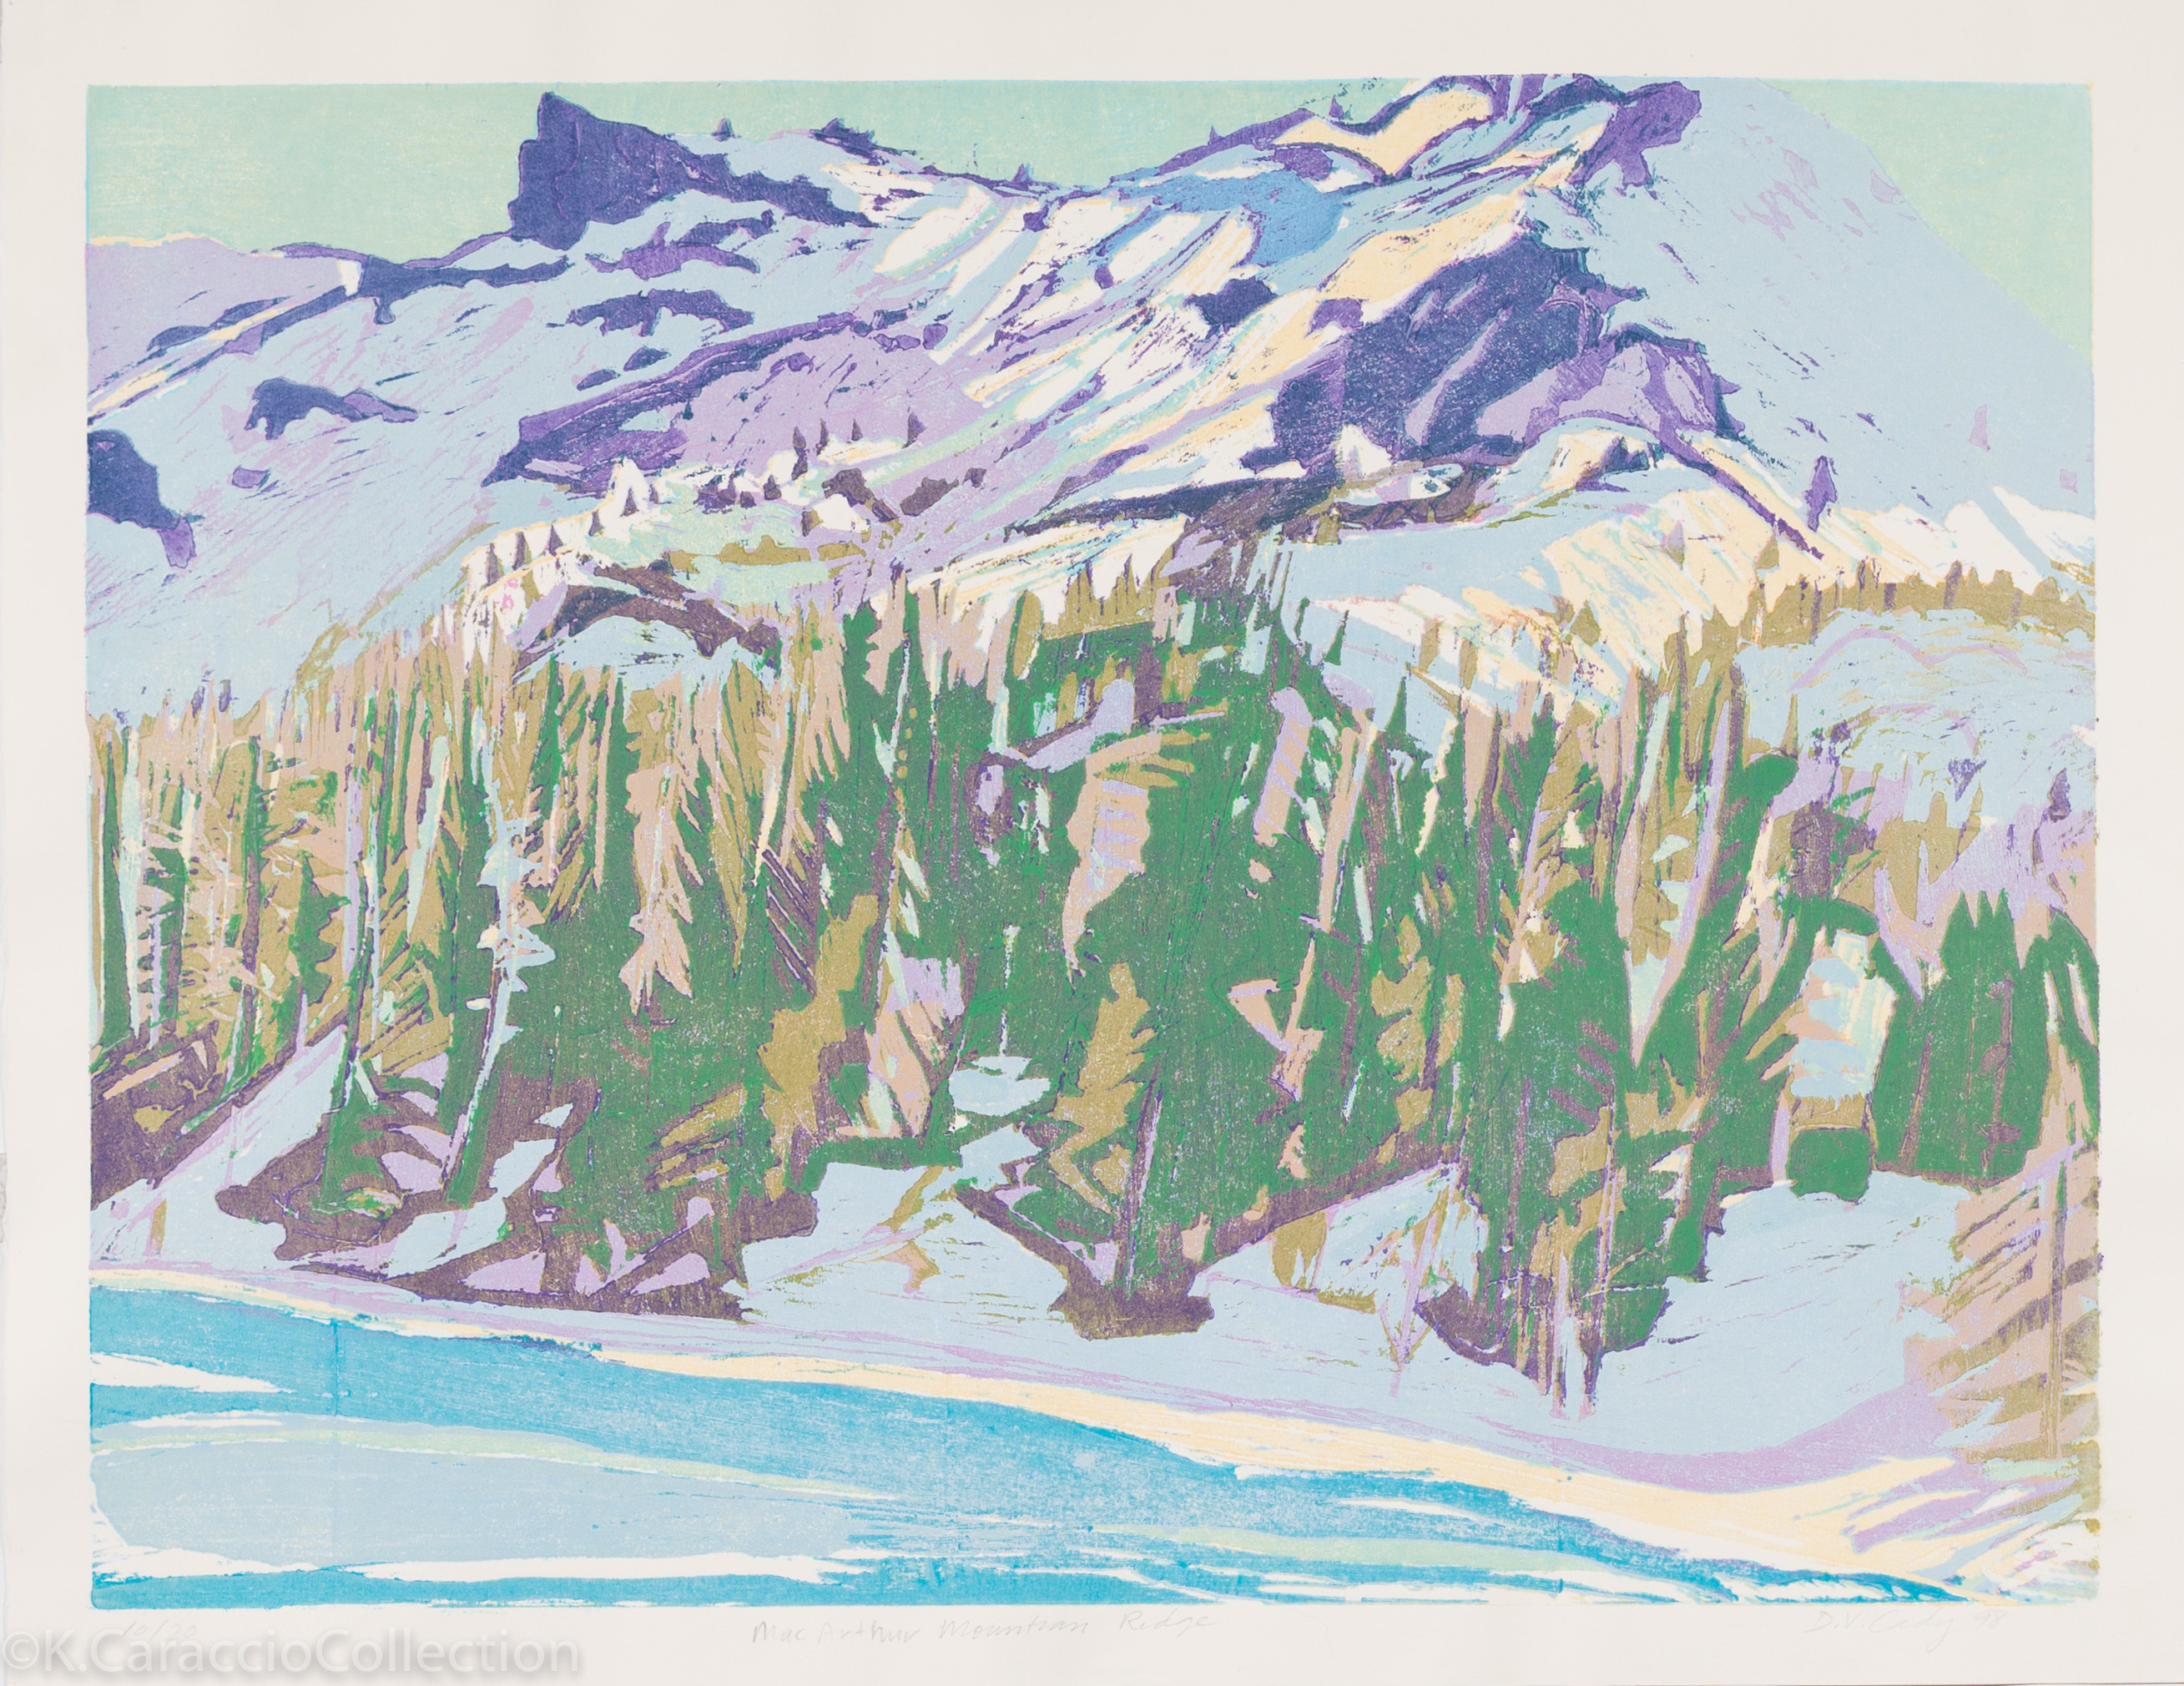 MacArthur Mountain Ridge, 1994